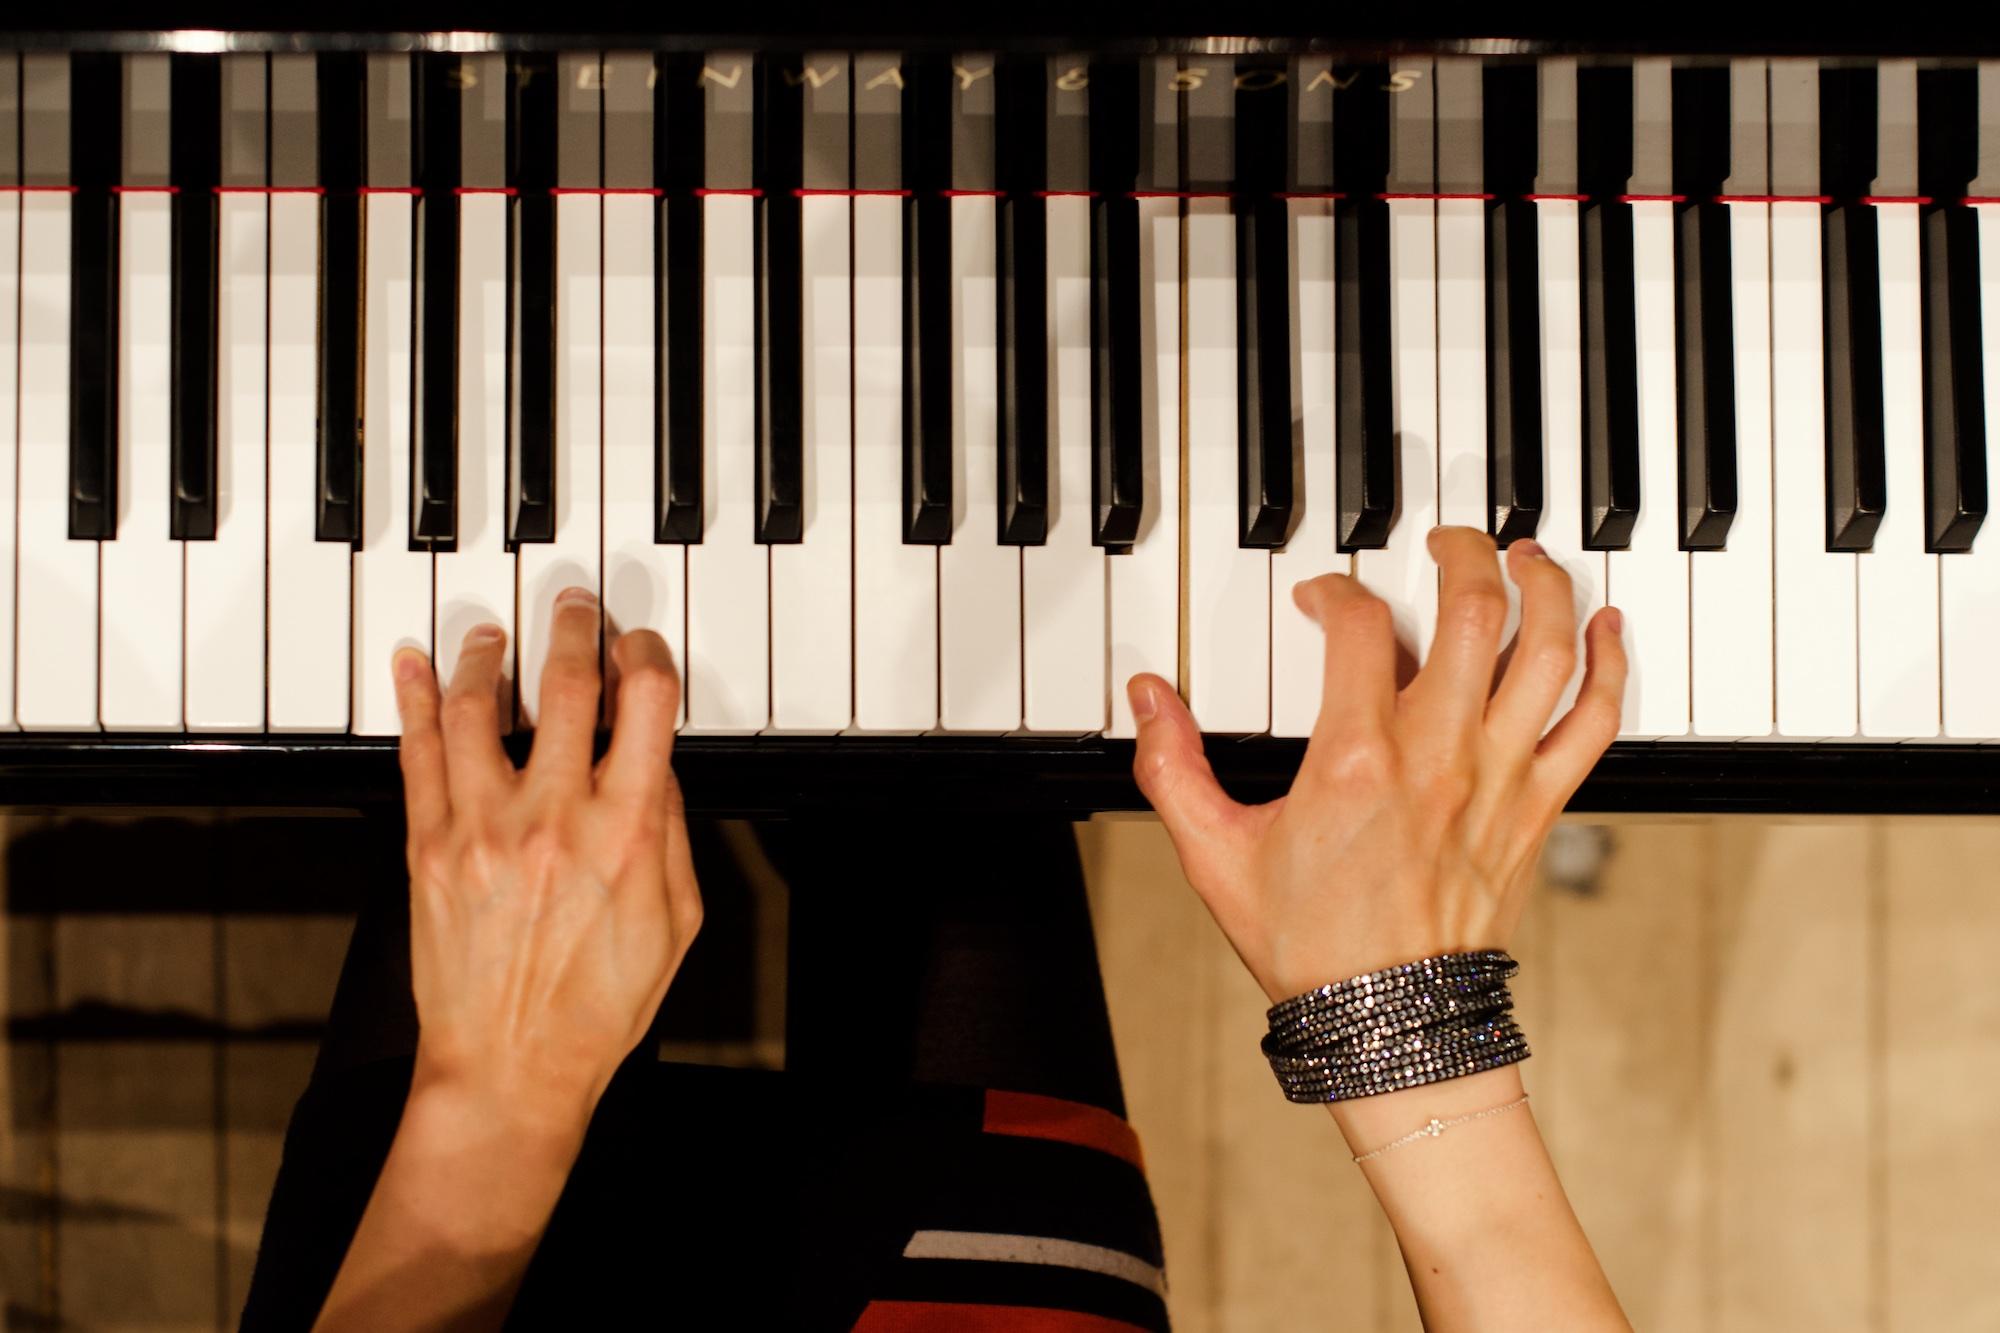 aisa-ijiri-carnegie-hall-steinway-piano-4 stairway and sons